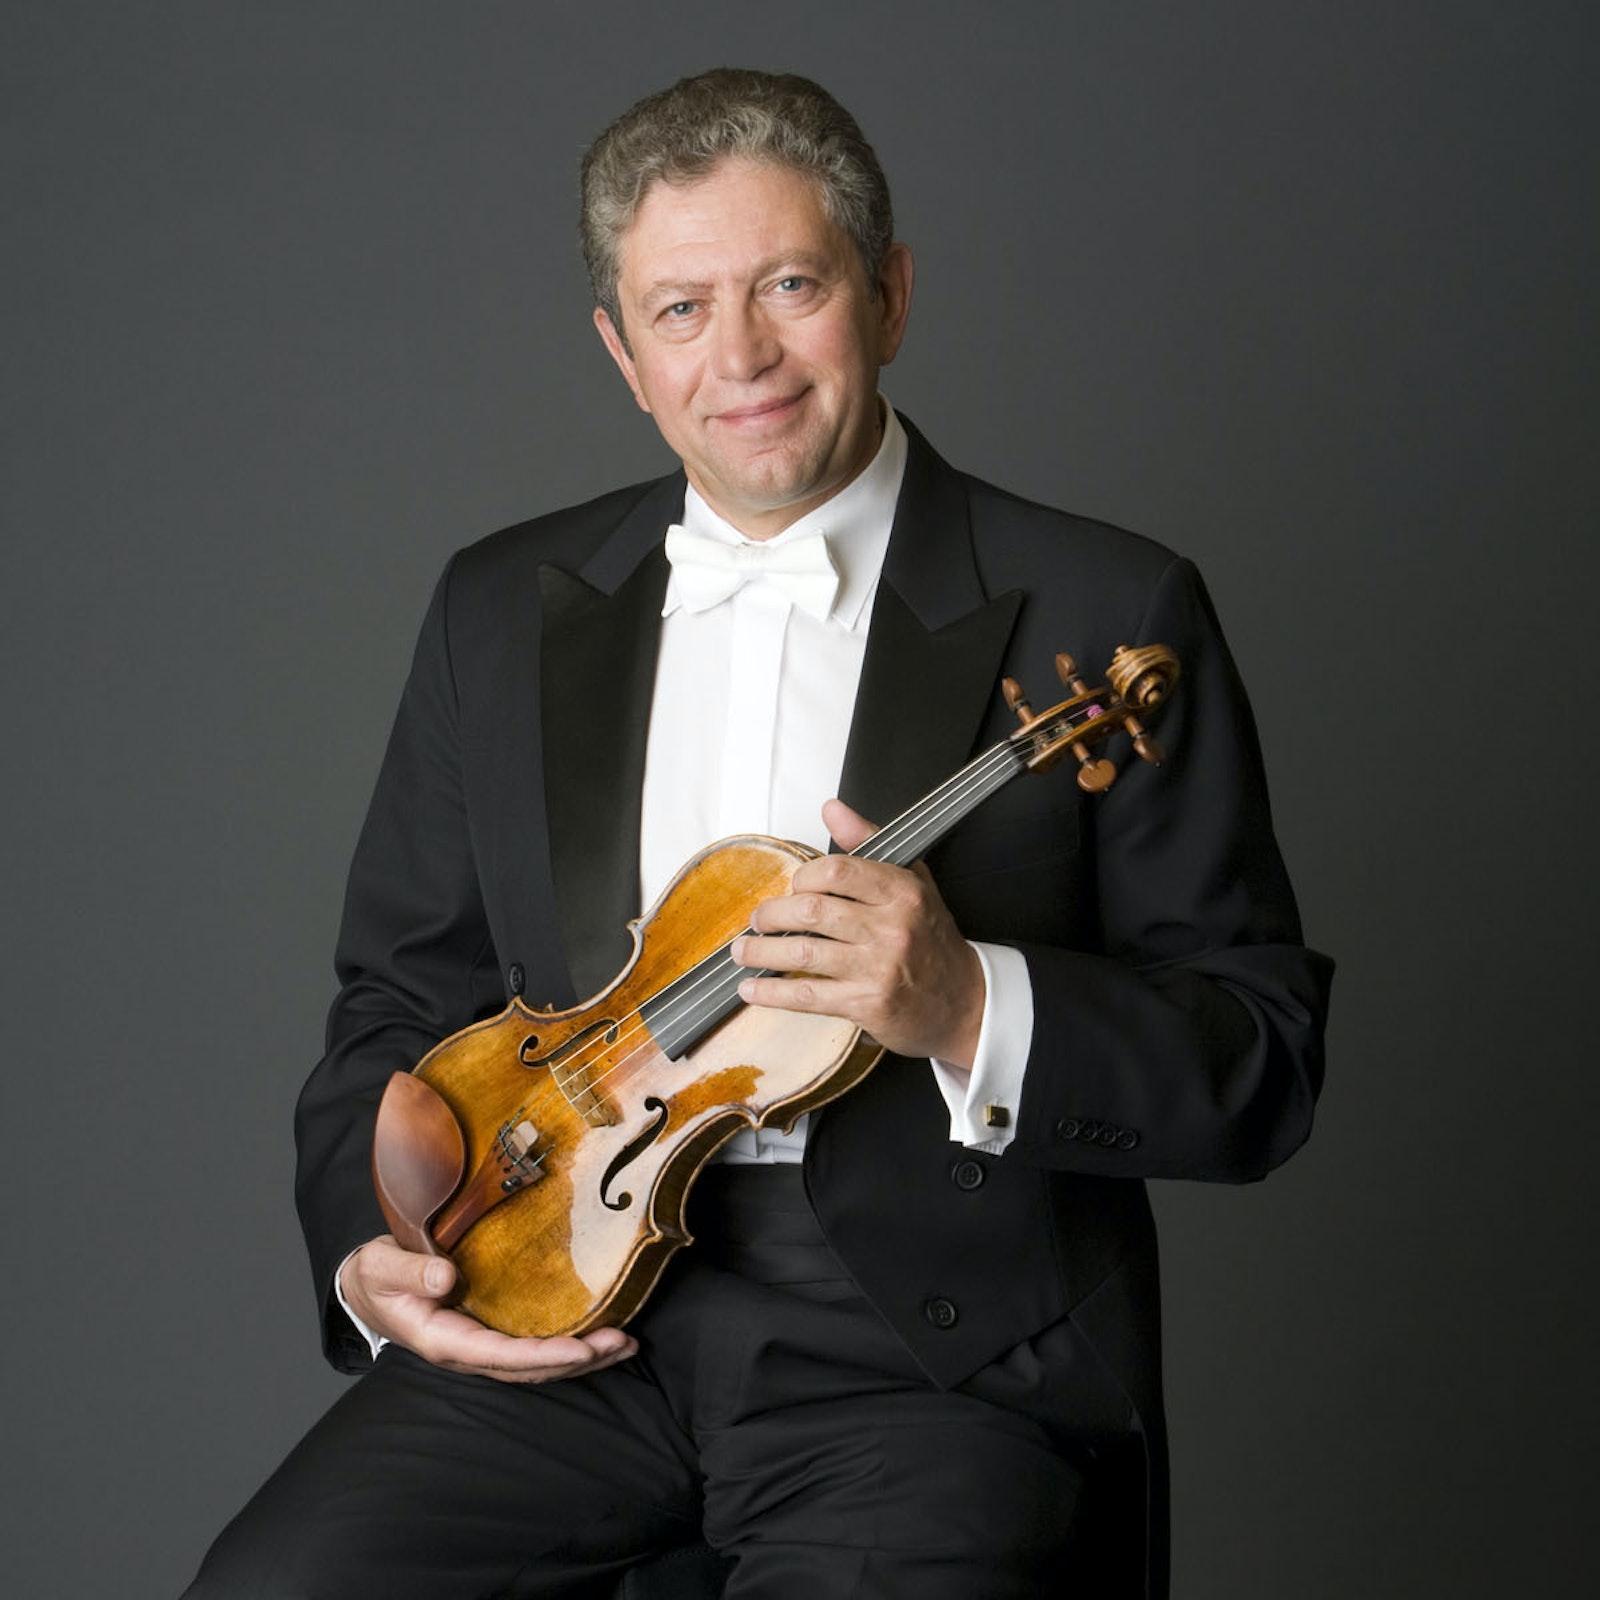 Alexander Barantschik